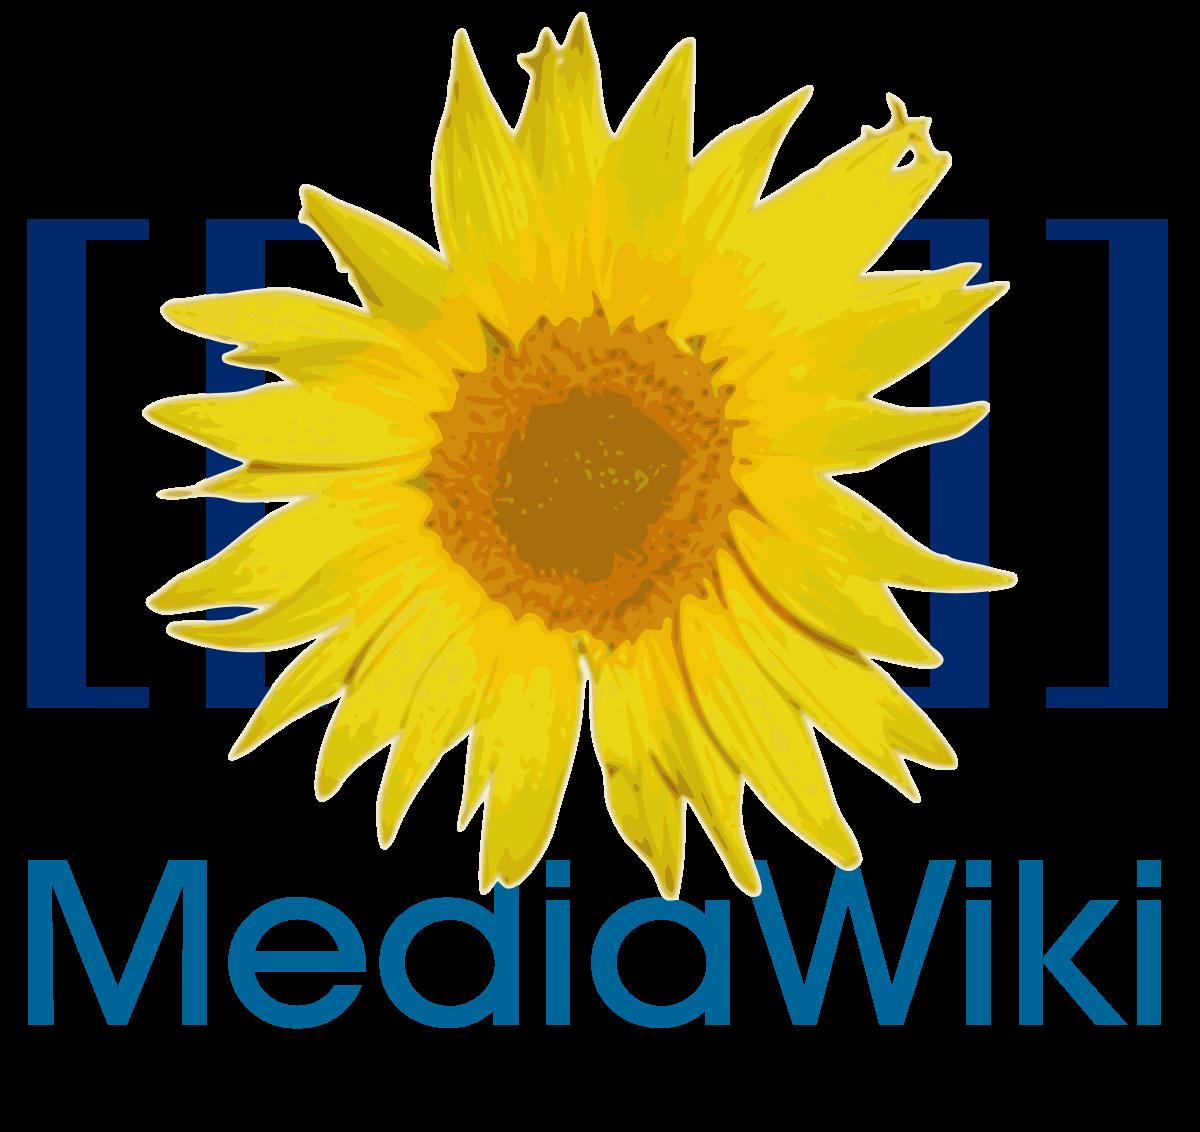 thumb_WDMyCloud_MediaWiki_1.23.15.png